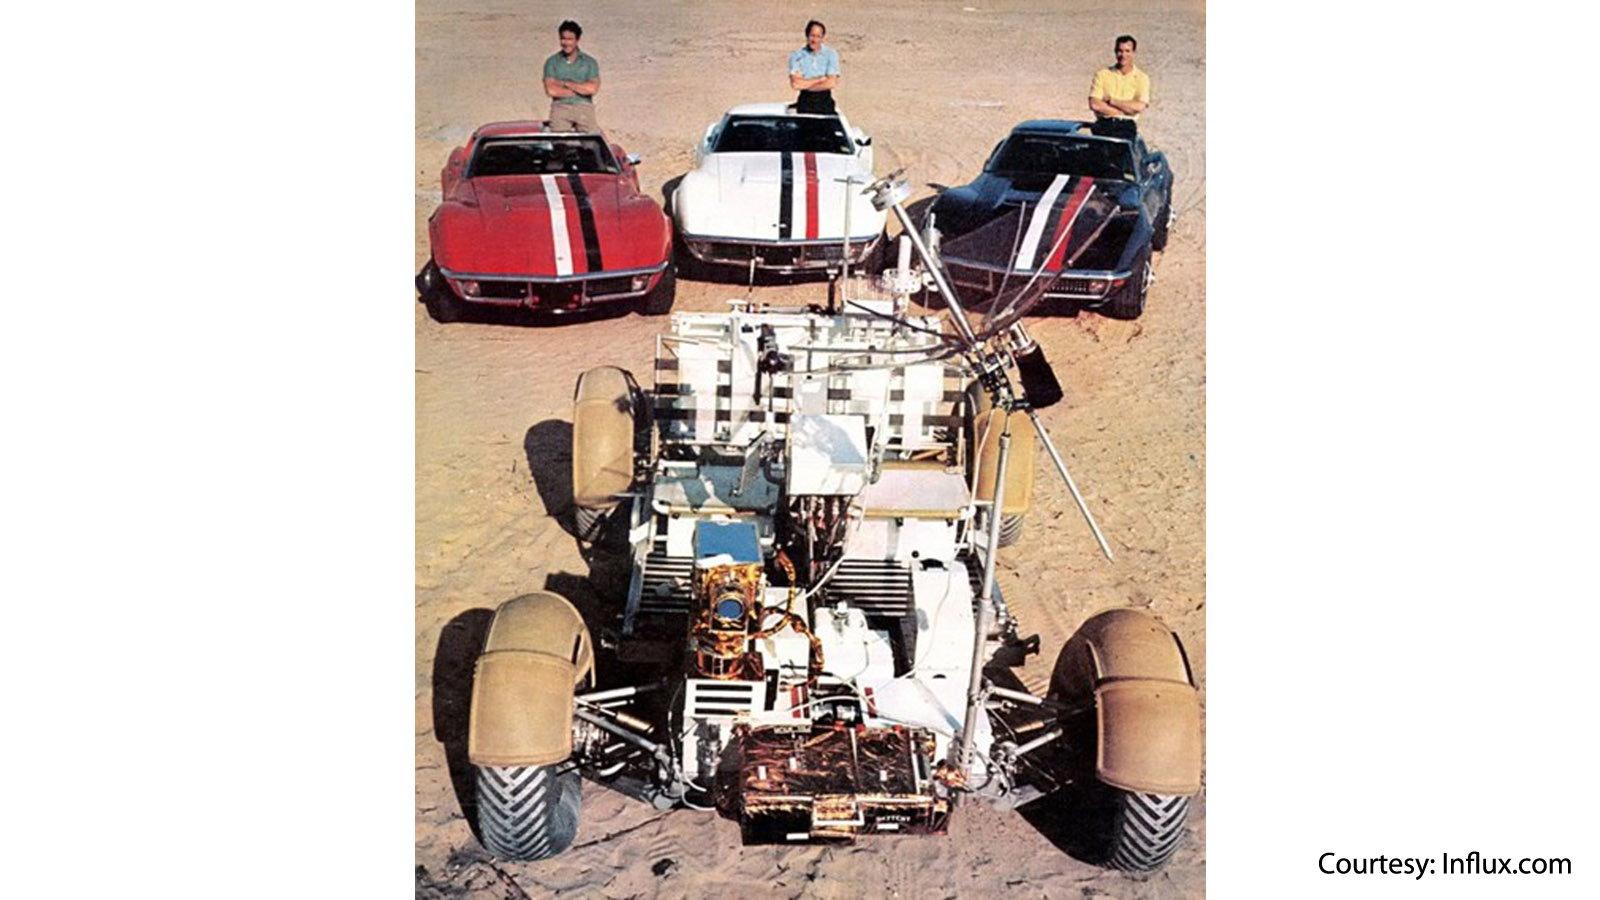 Apollo 15 Crewmembers